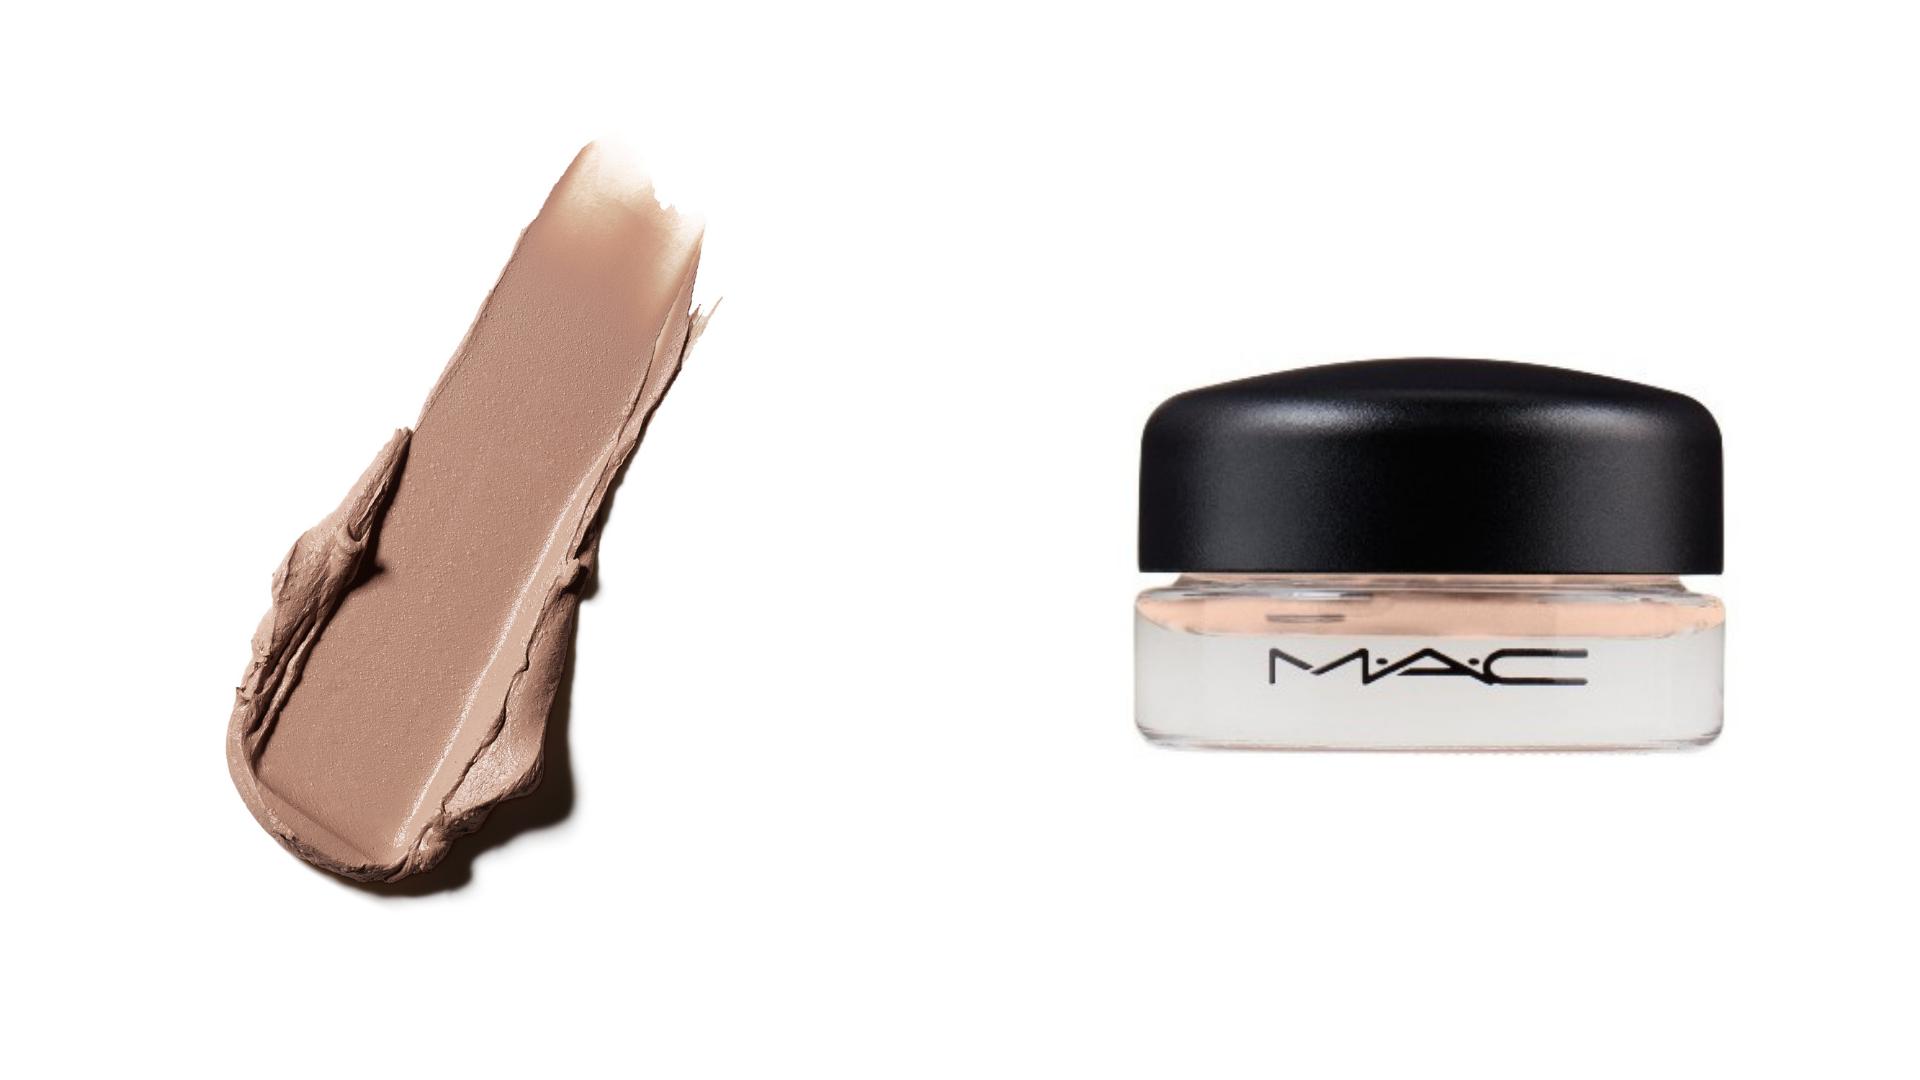 Two photos show a streak of cream eyeshadow and a pot of cream eyeshadow